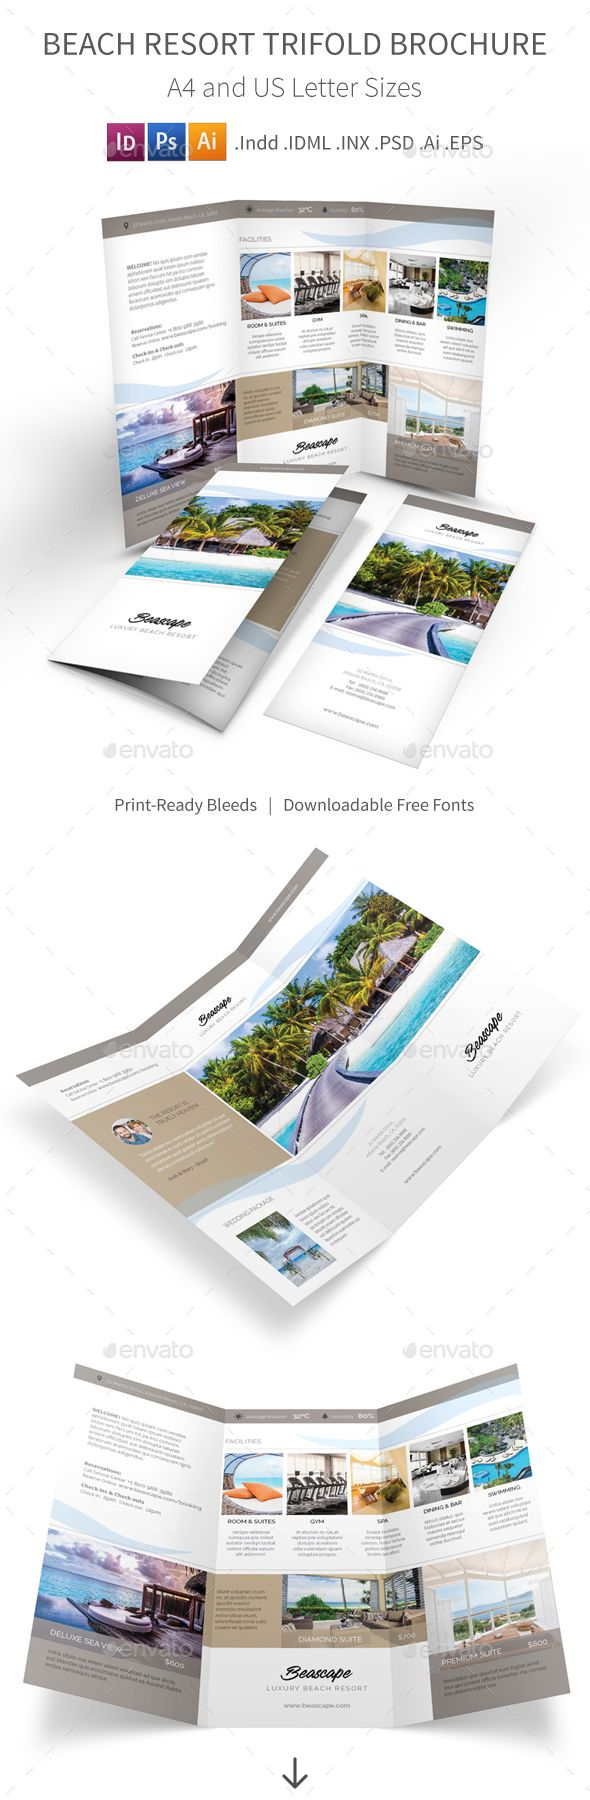 Beach Resort Trifold Brochure 2 Brochure Template Brochures And